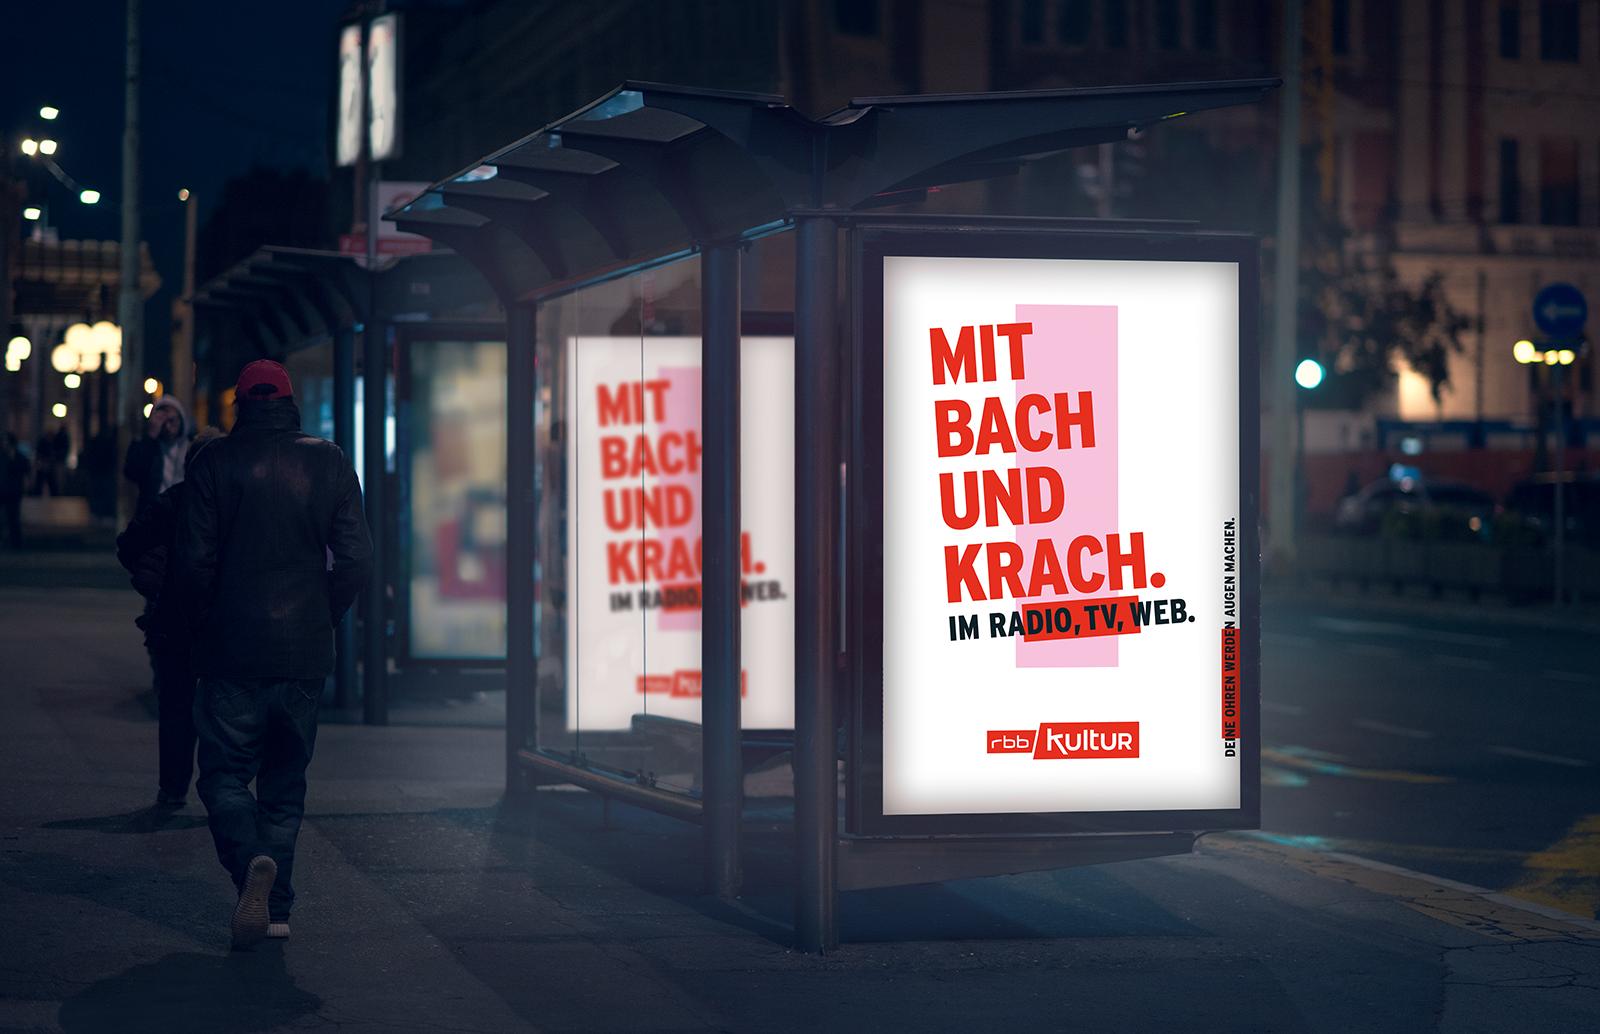 mitBachundKrach